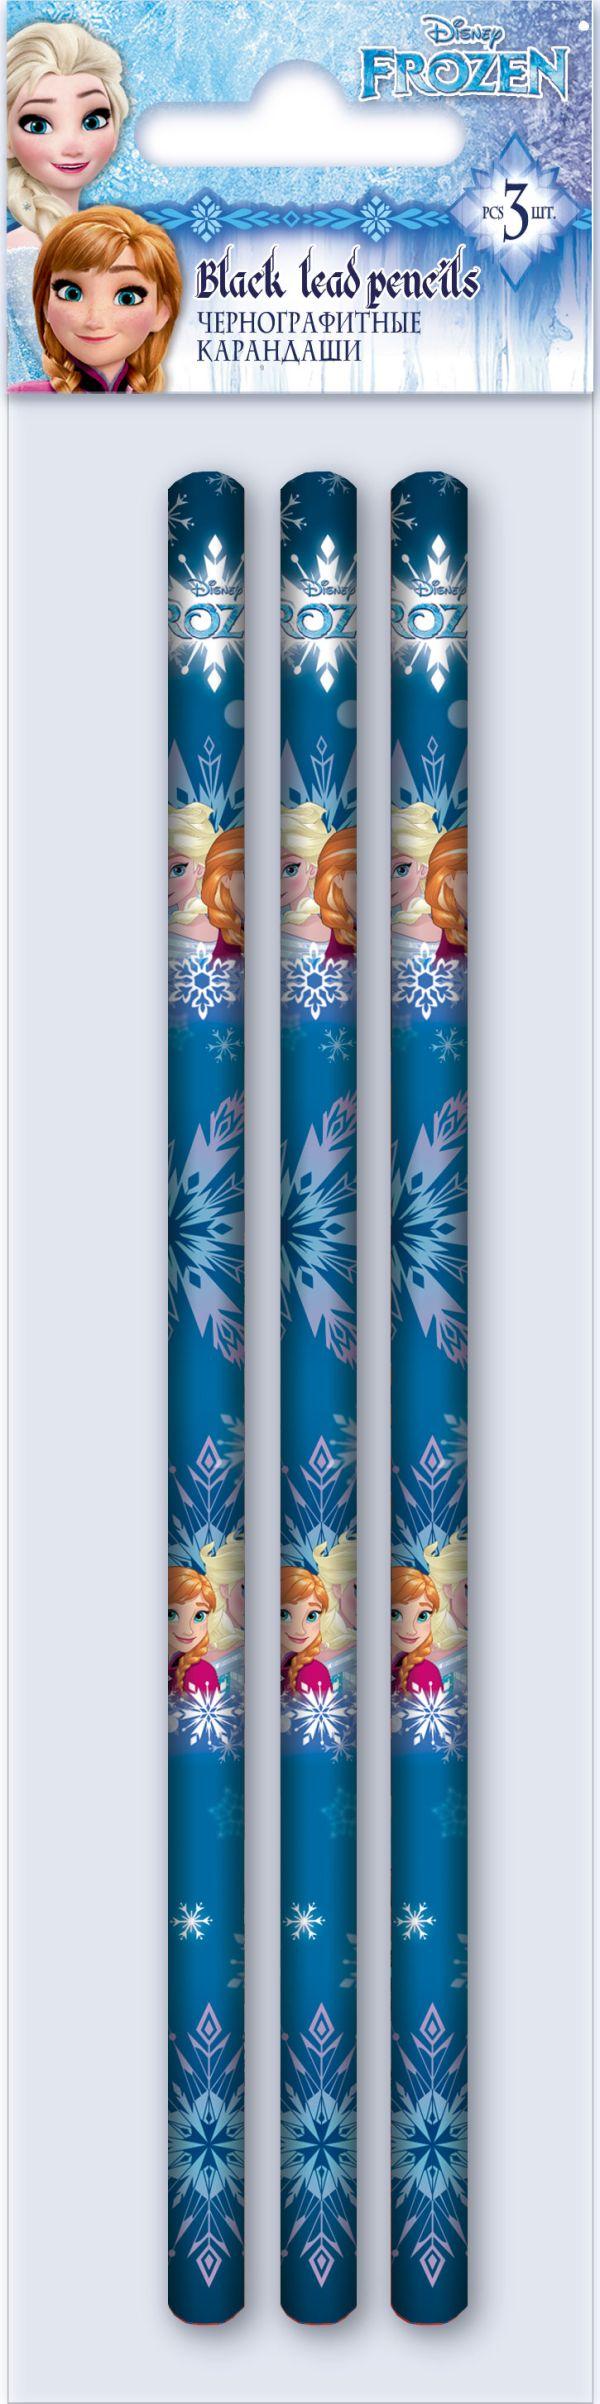 FZDB-US1-102-H3 Карандаши простые. Набор 3 шт, в ПП-пакете.. Frozen